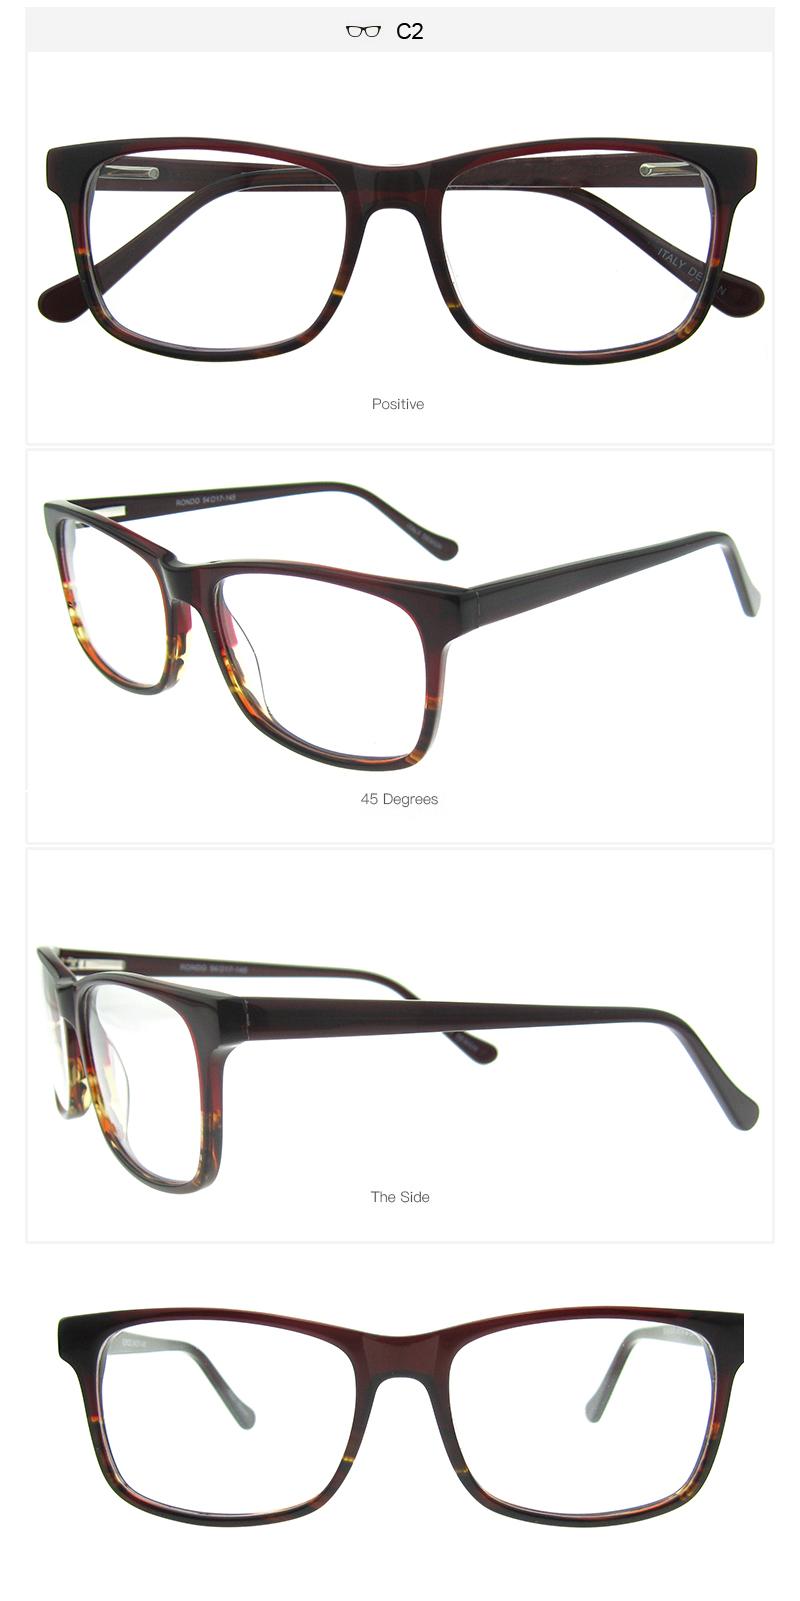 OCCI CHIARI Glasses Men and Women Prescription Nerd Lens Medical ...